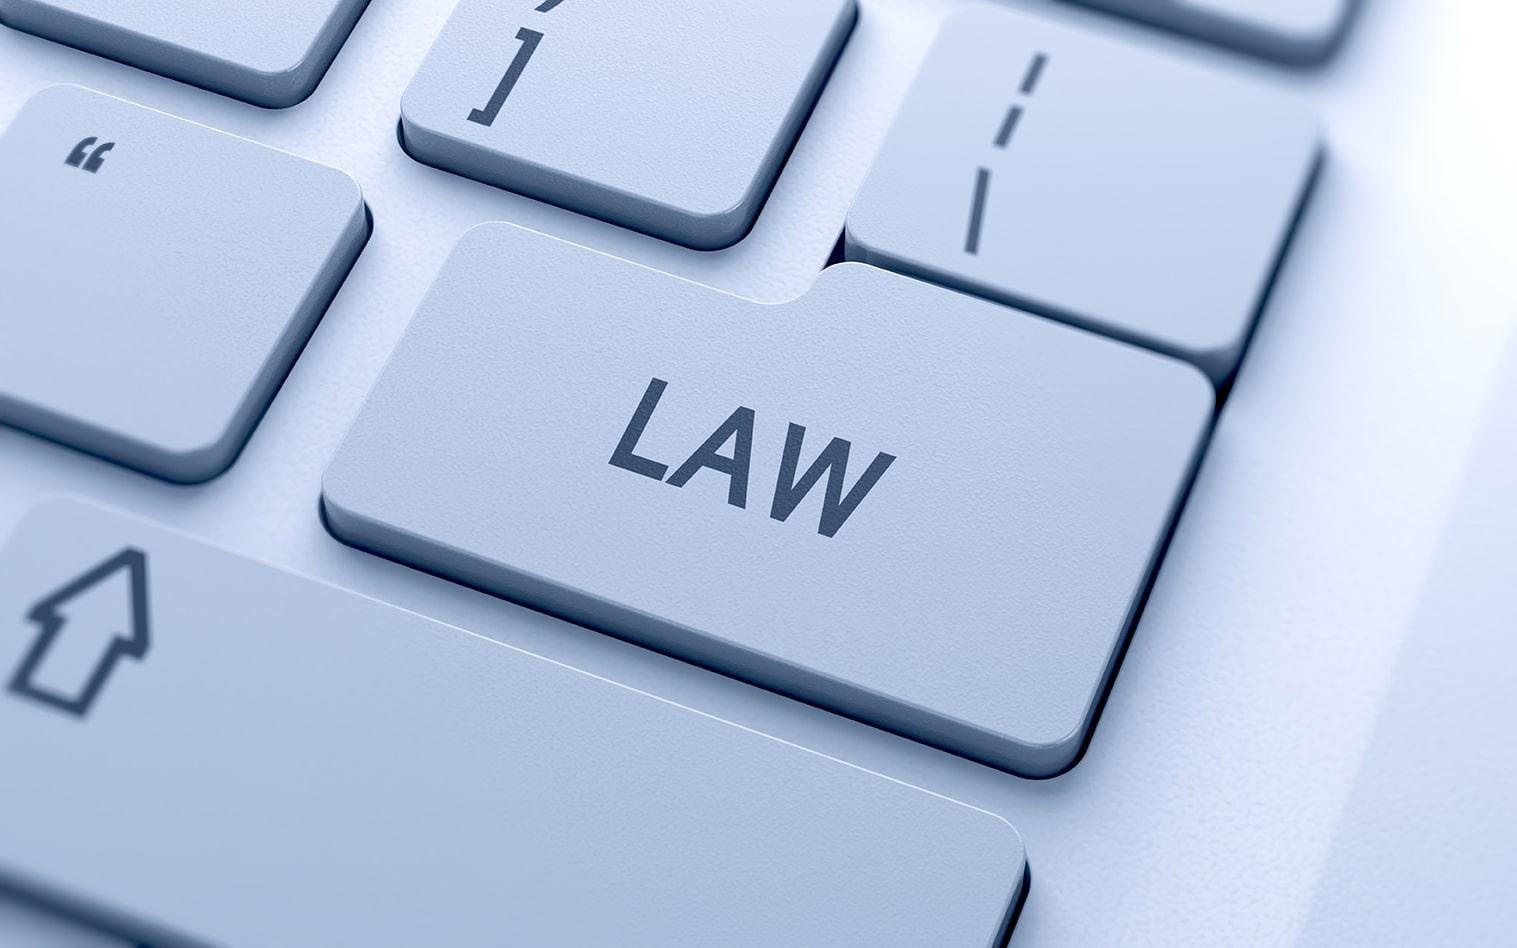 Merak MyMerak advantage lawyers fast digital retrieval